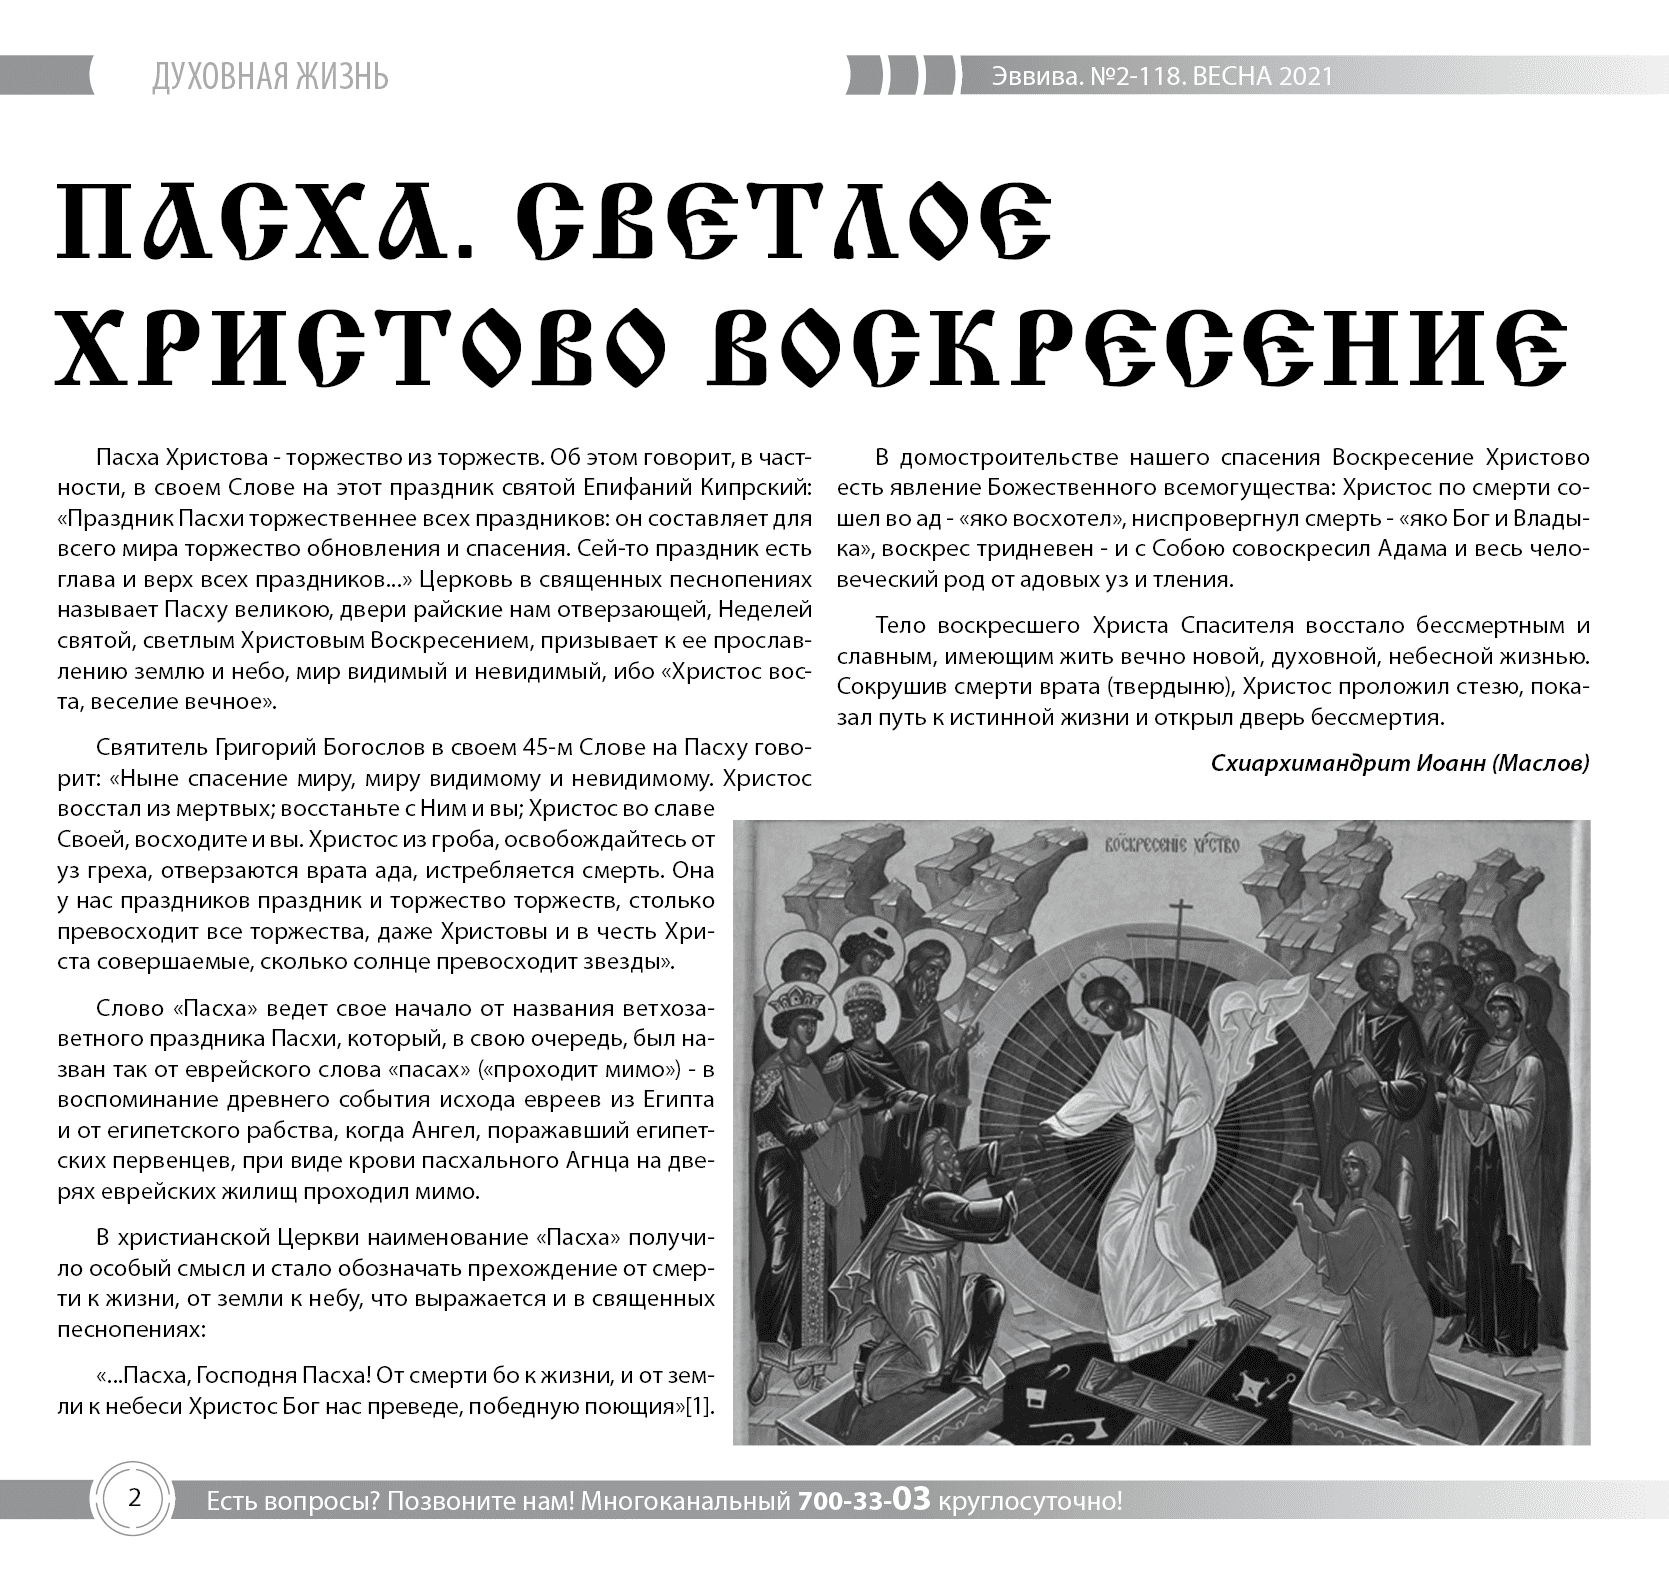 evviva-zhurnal-118-page2